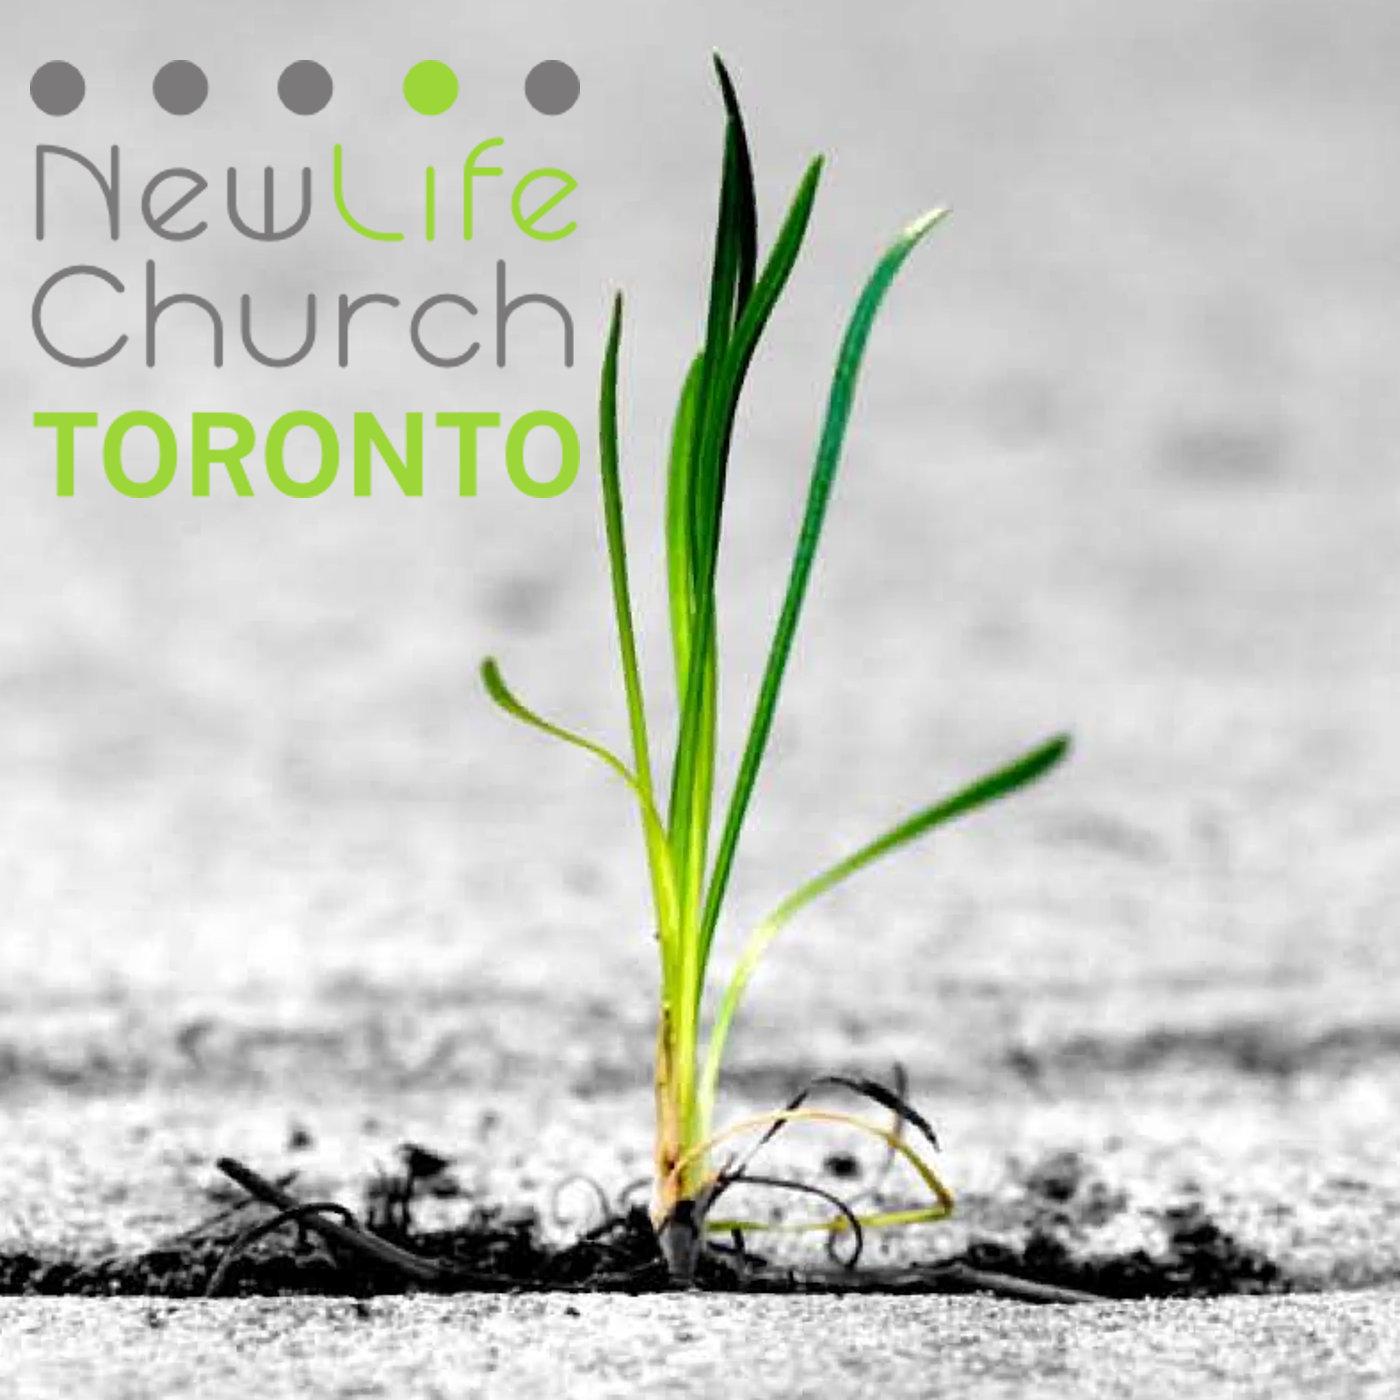 Newlife Church, Toronto